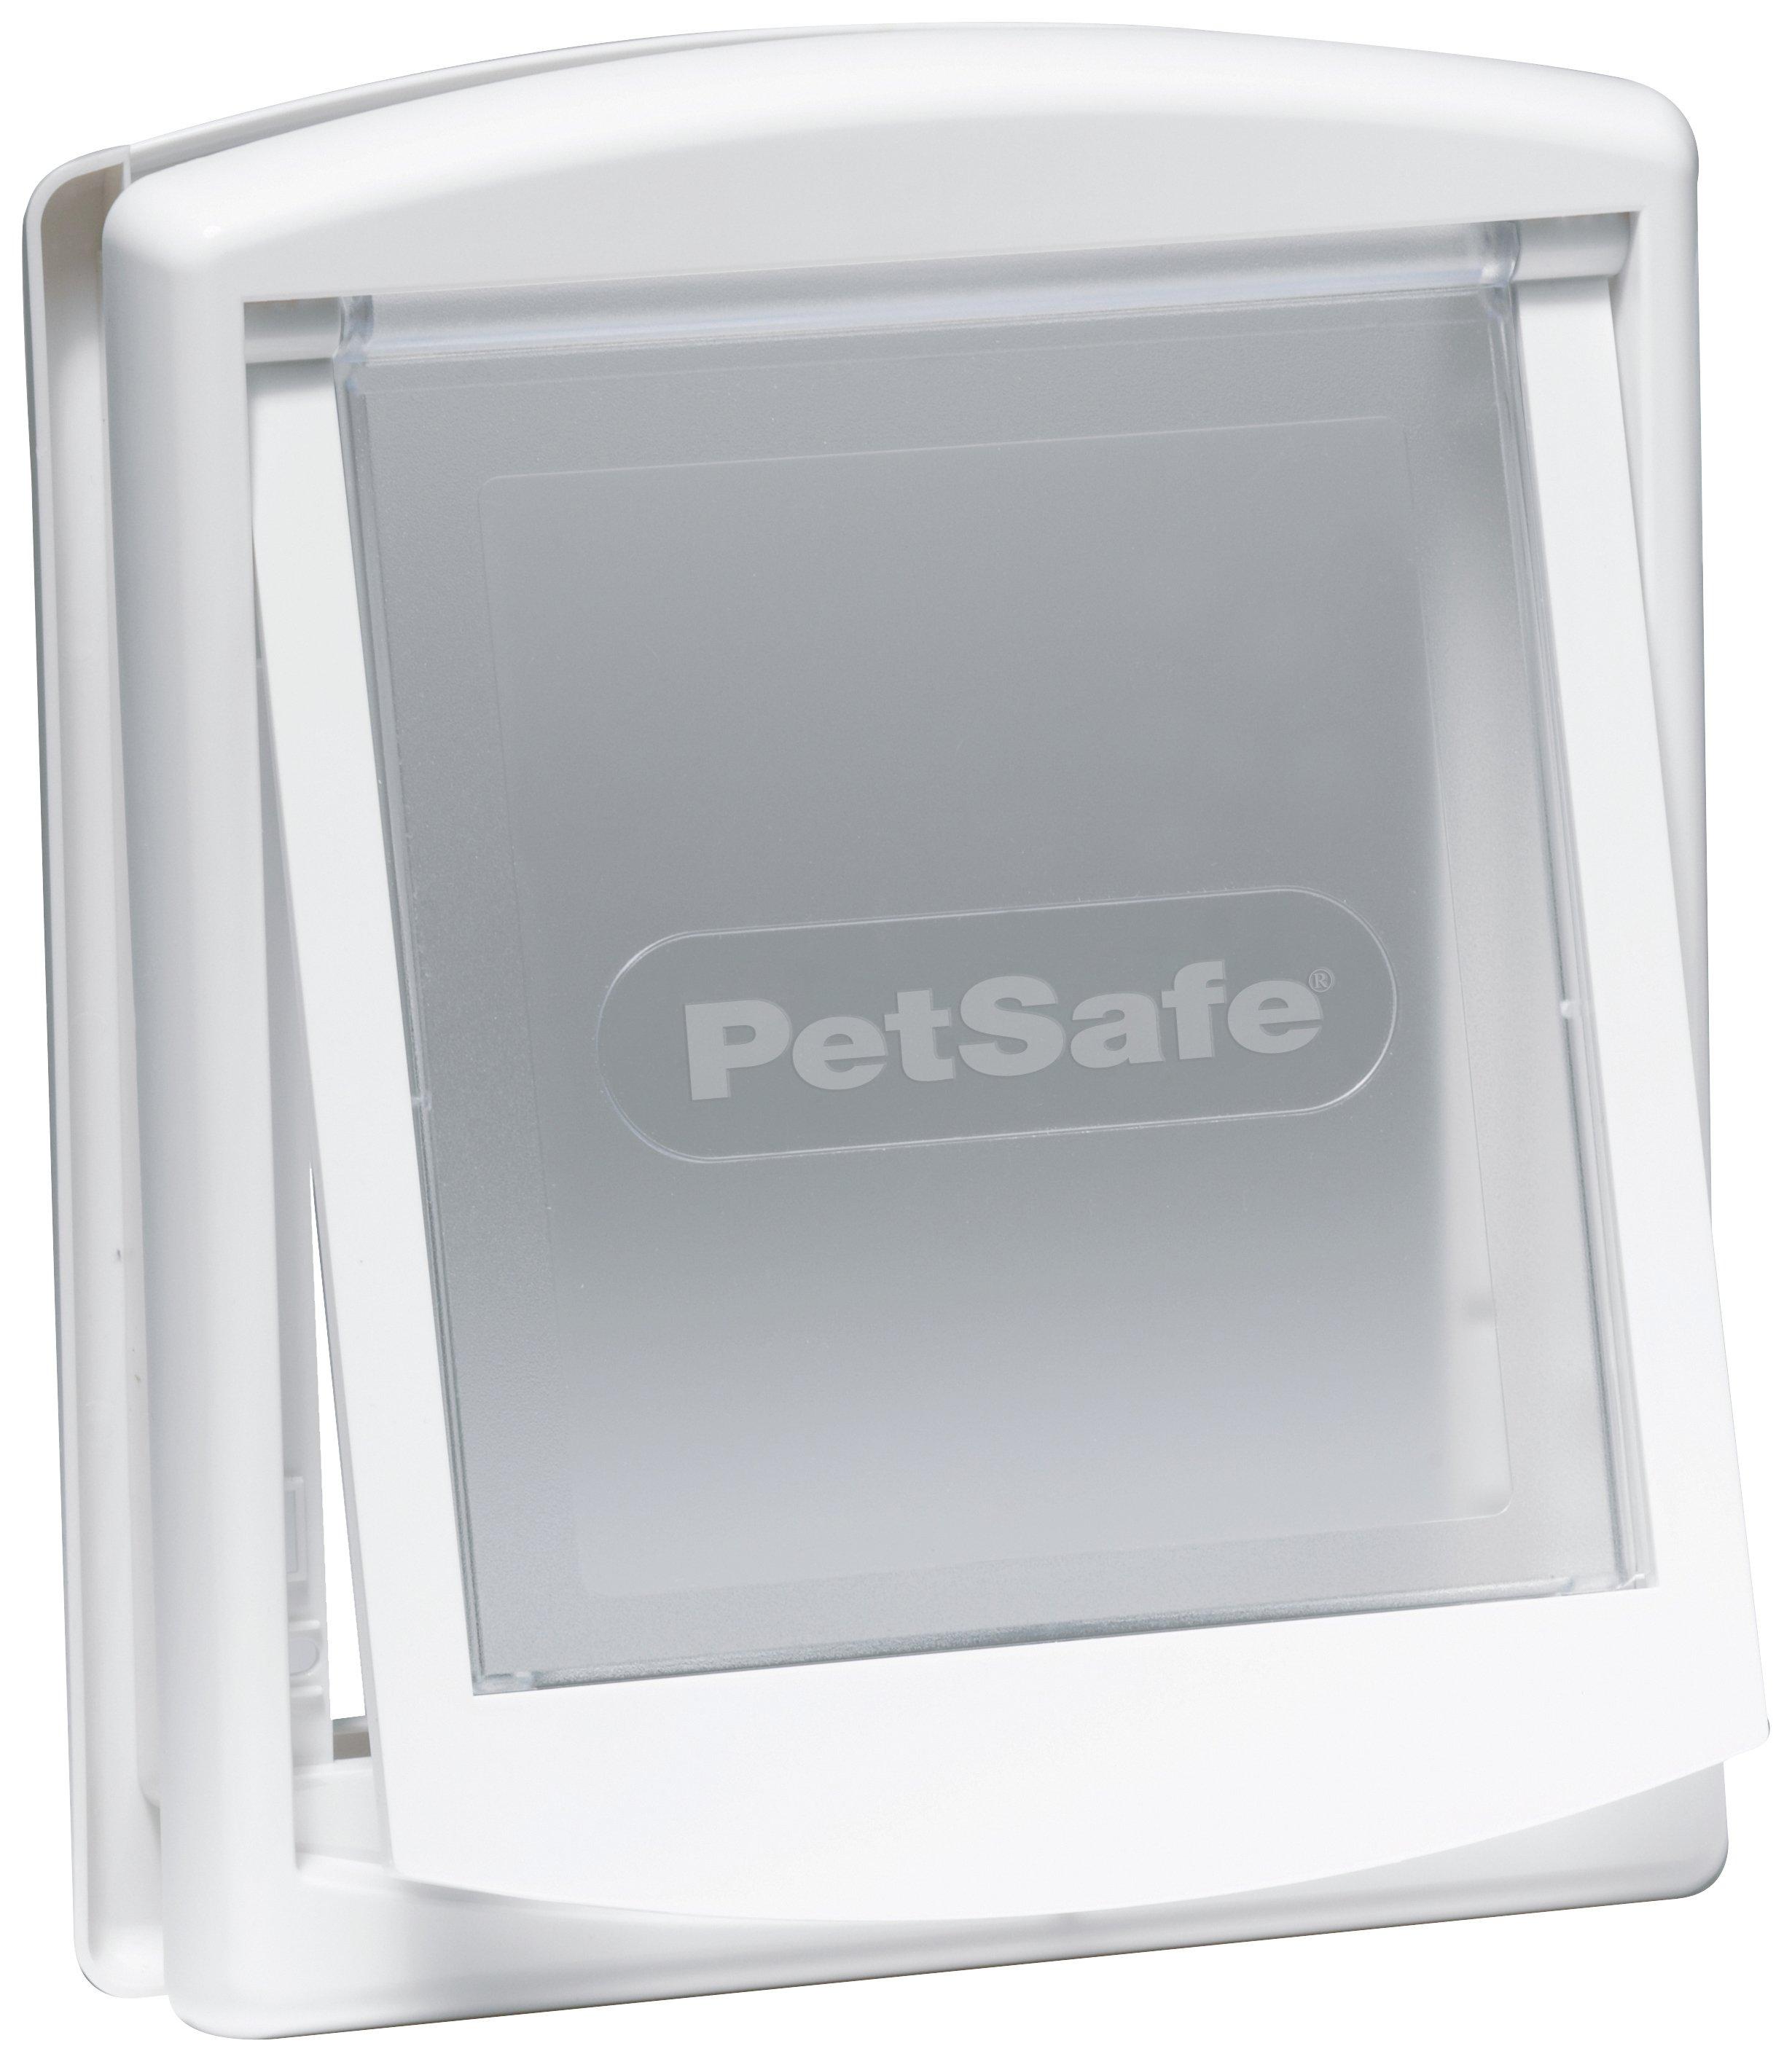 PetSafe Staywell Original 2-Way Pet Door - Small White